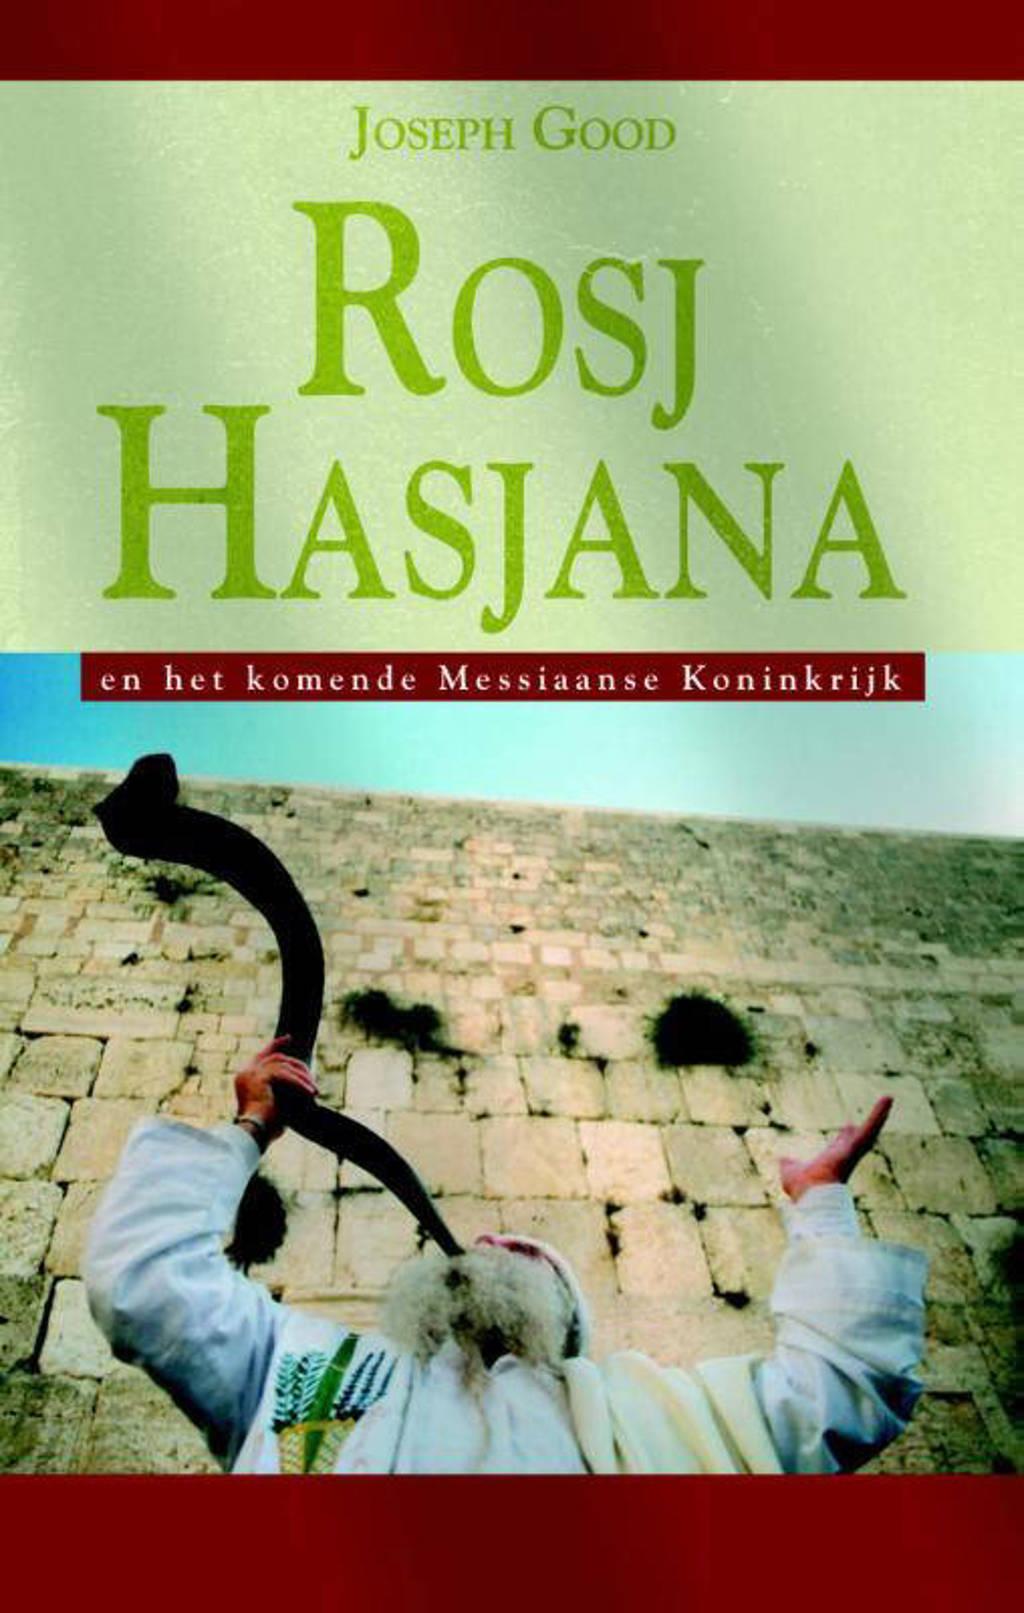 Rosj Hasjana en het komende Messiaanse Rijk - Joseph Good